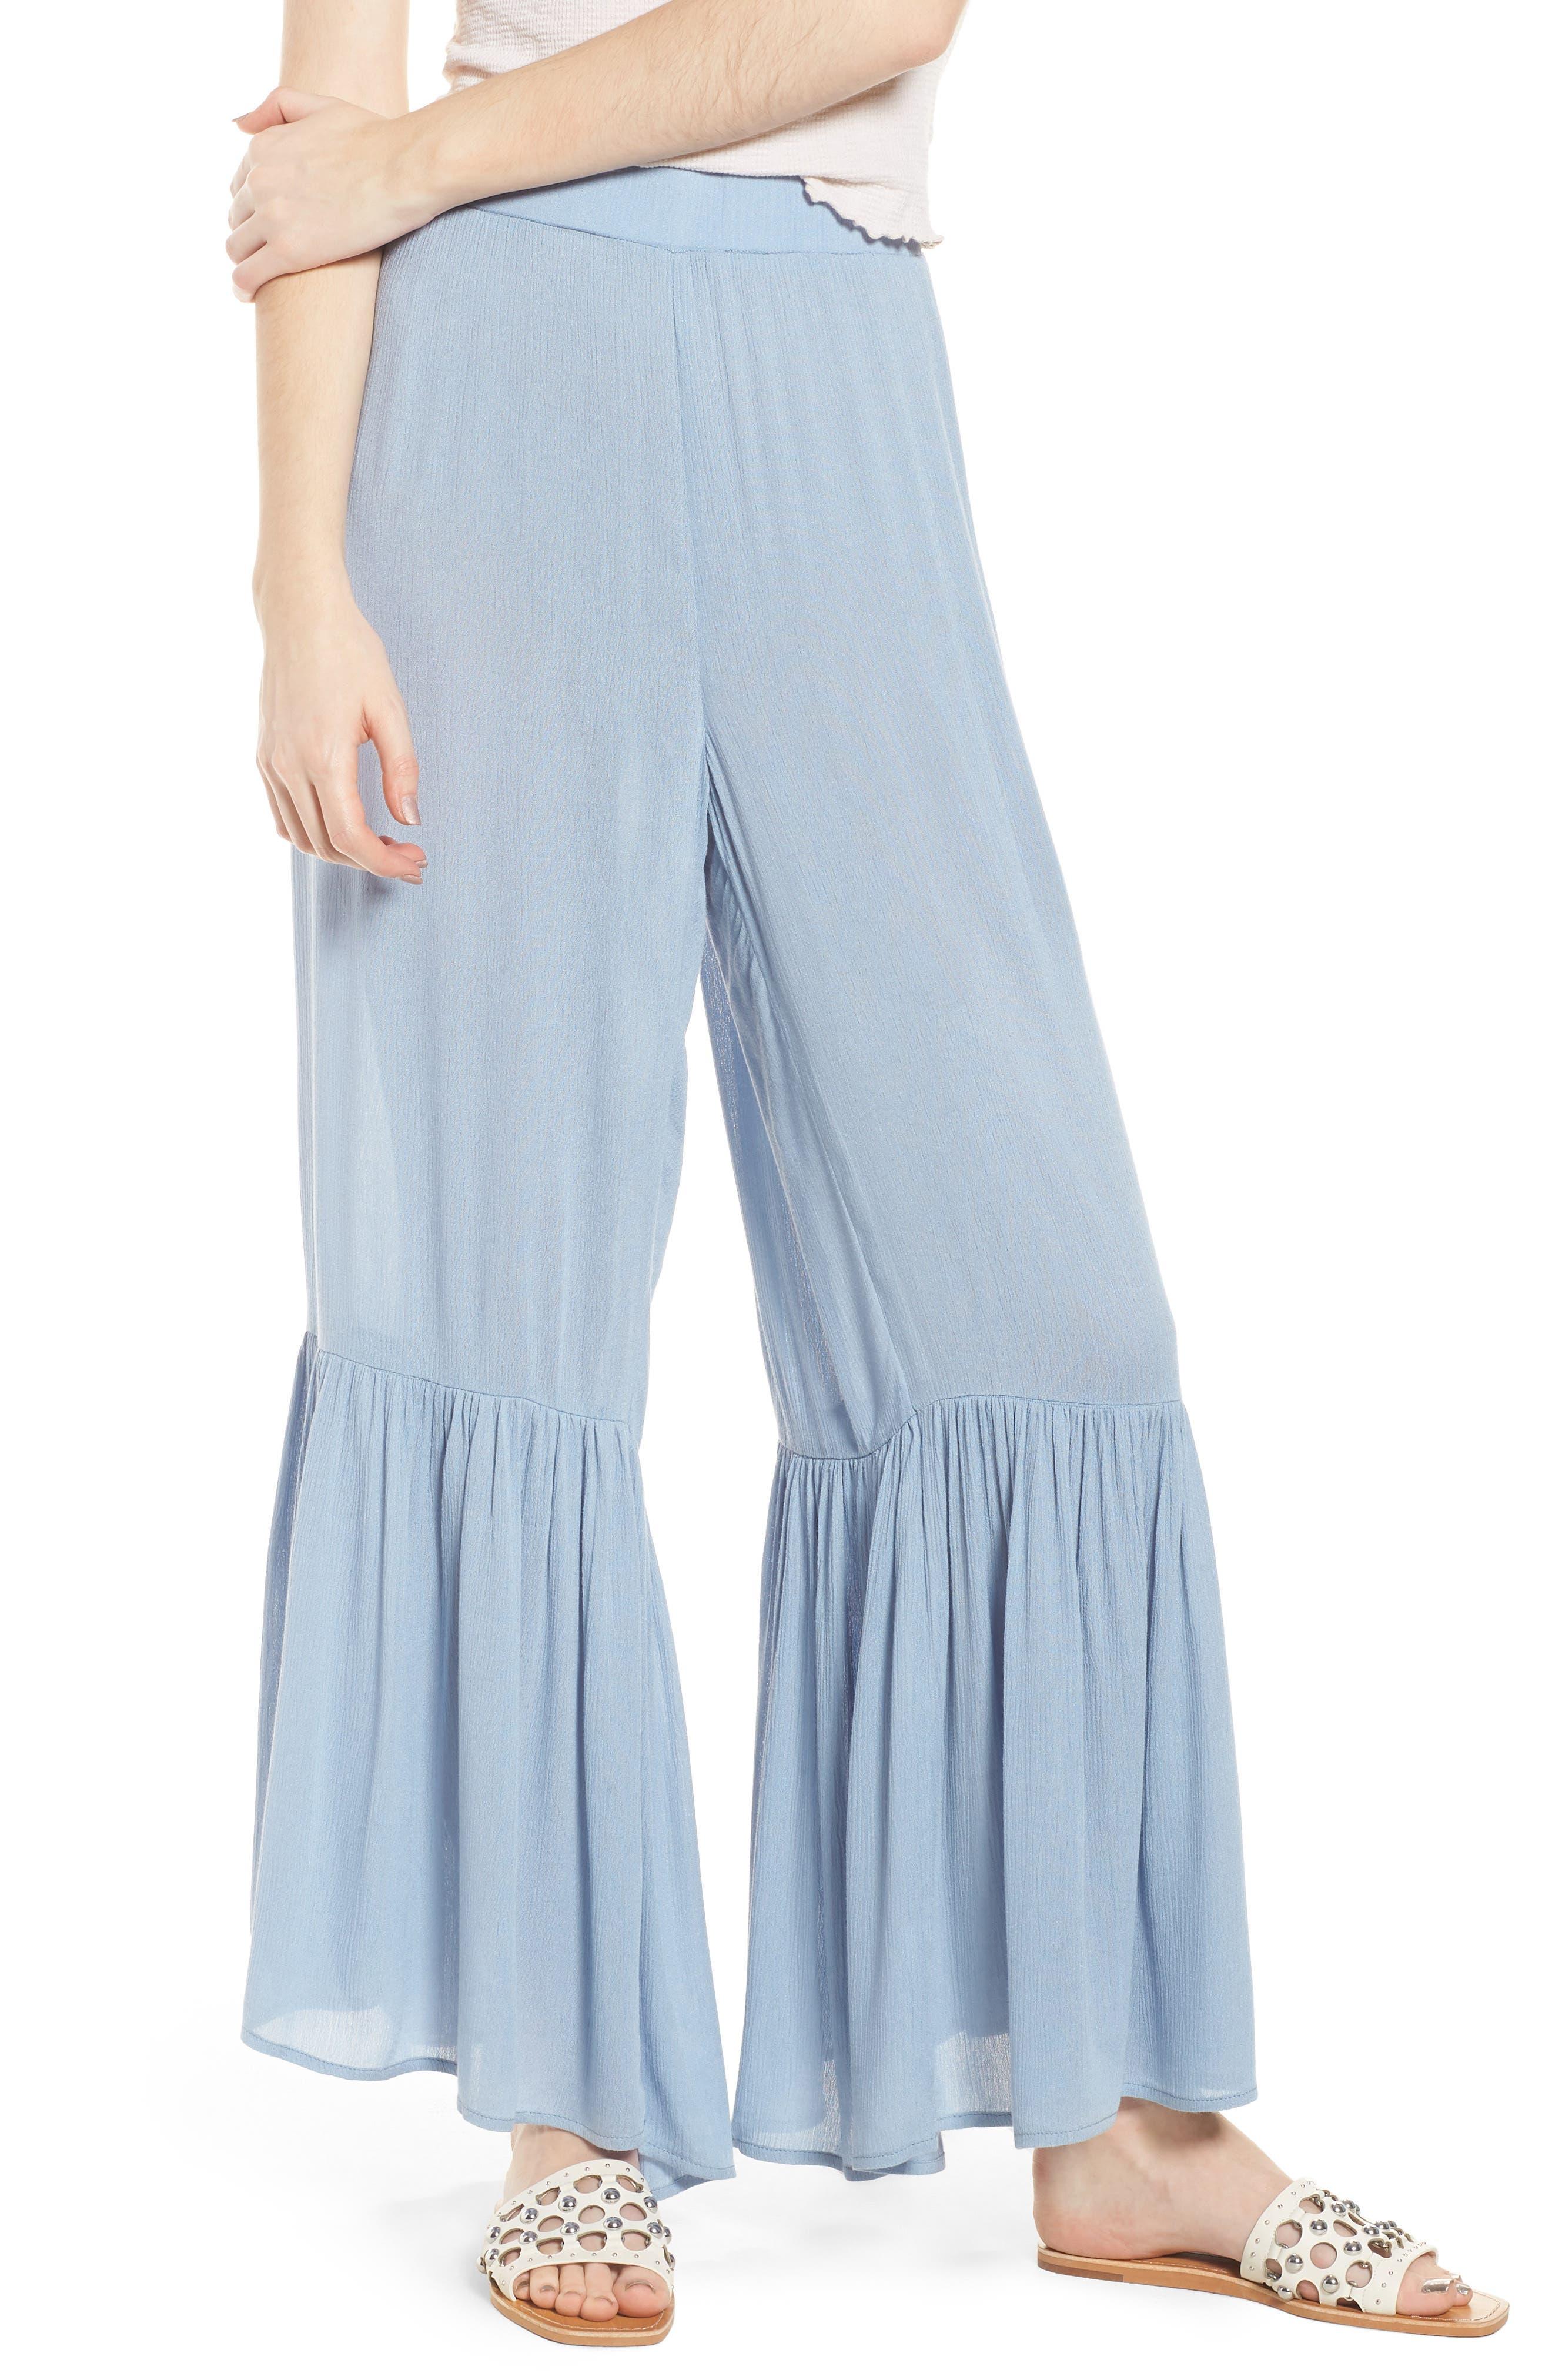 Mystique Ruffle Hem Beach Pants,                             Main thumbnail 1, color,                             Blue